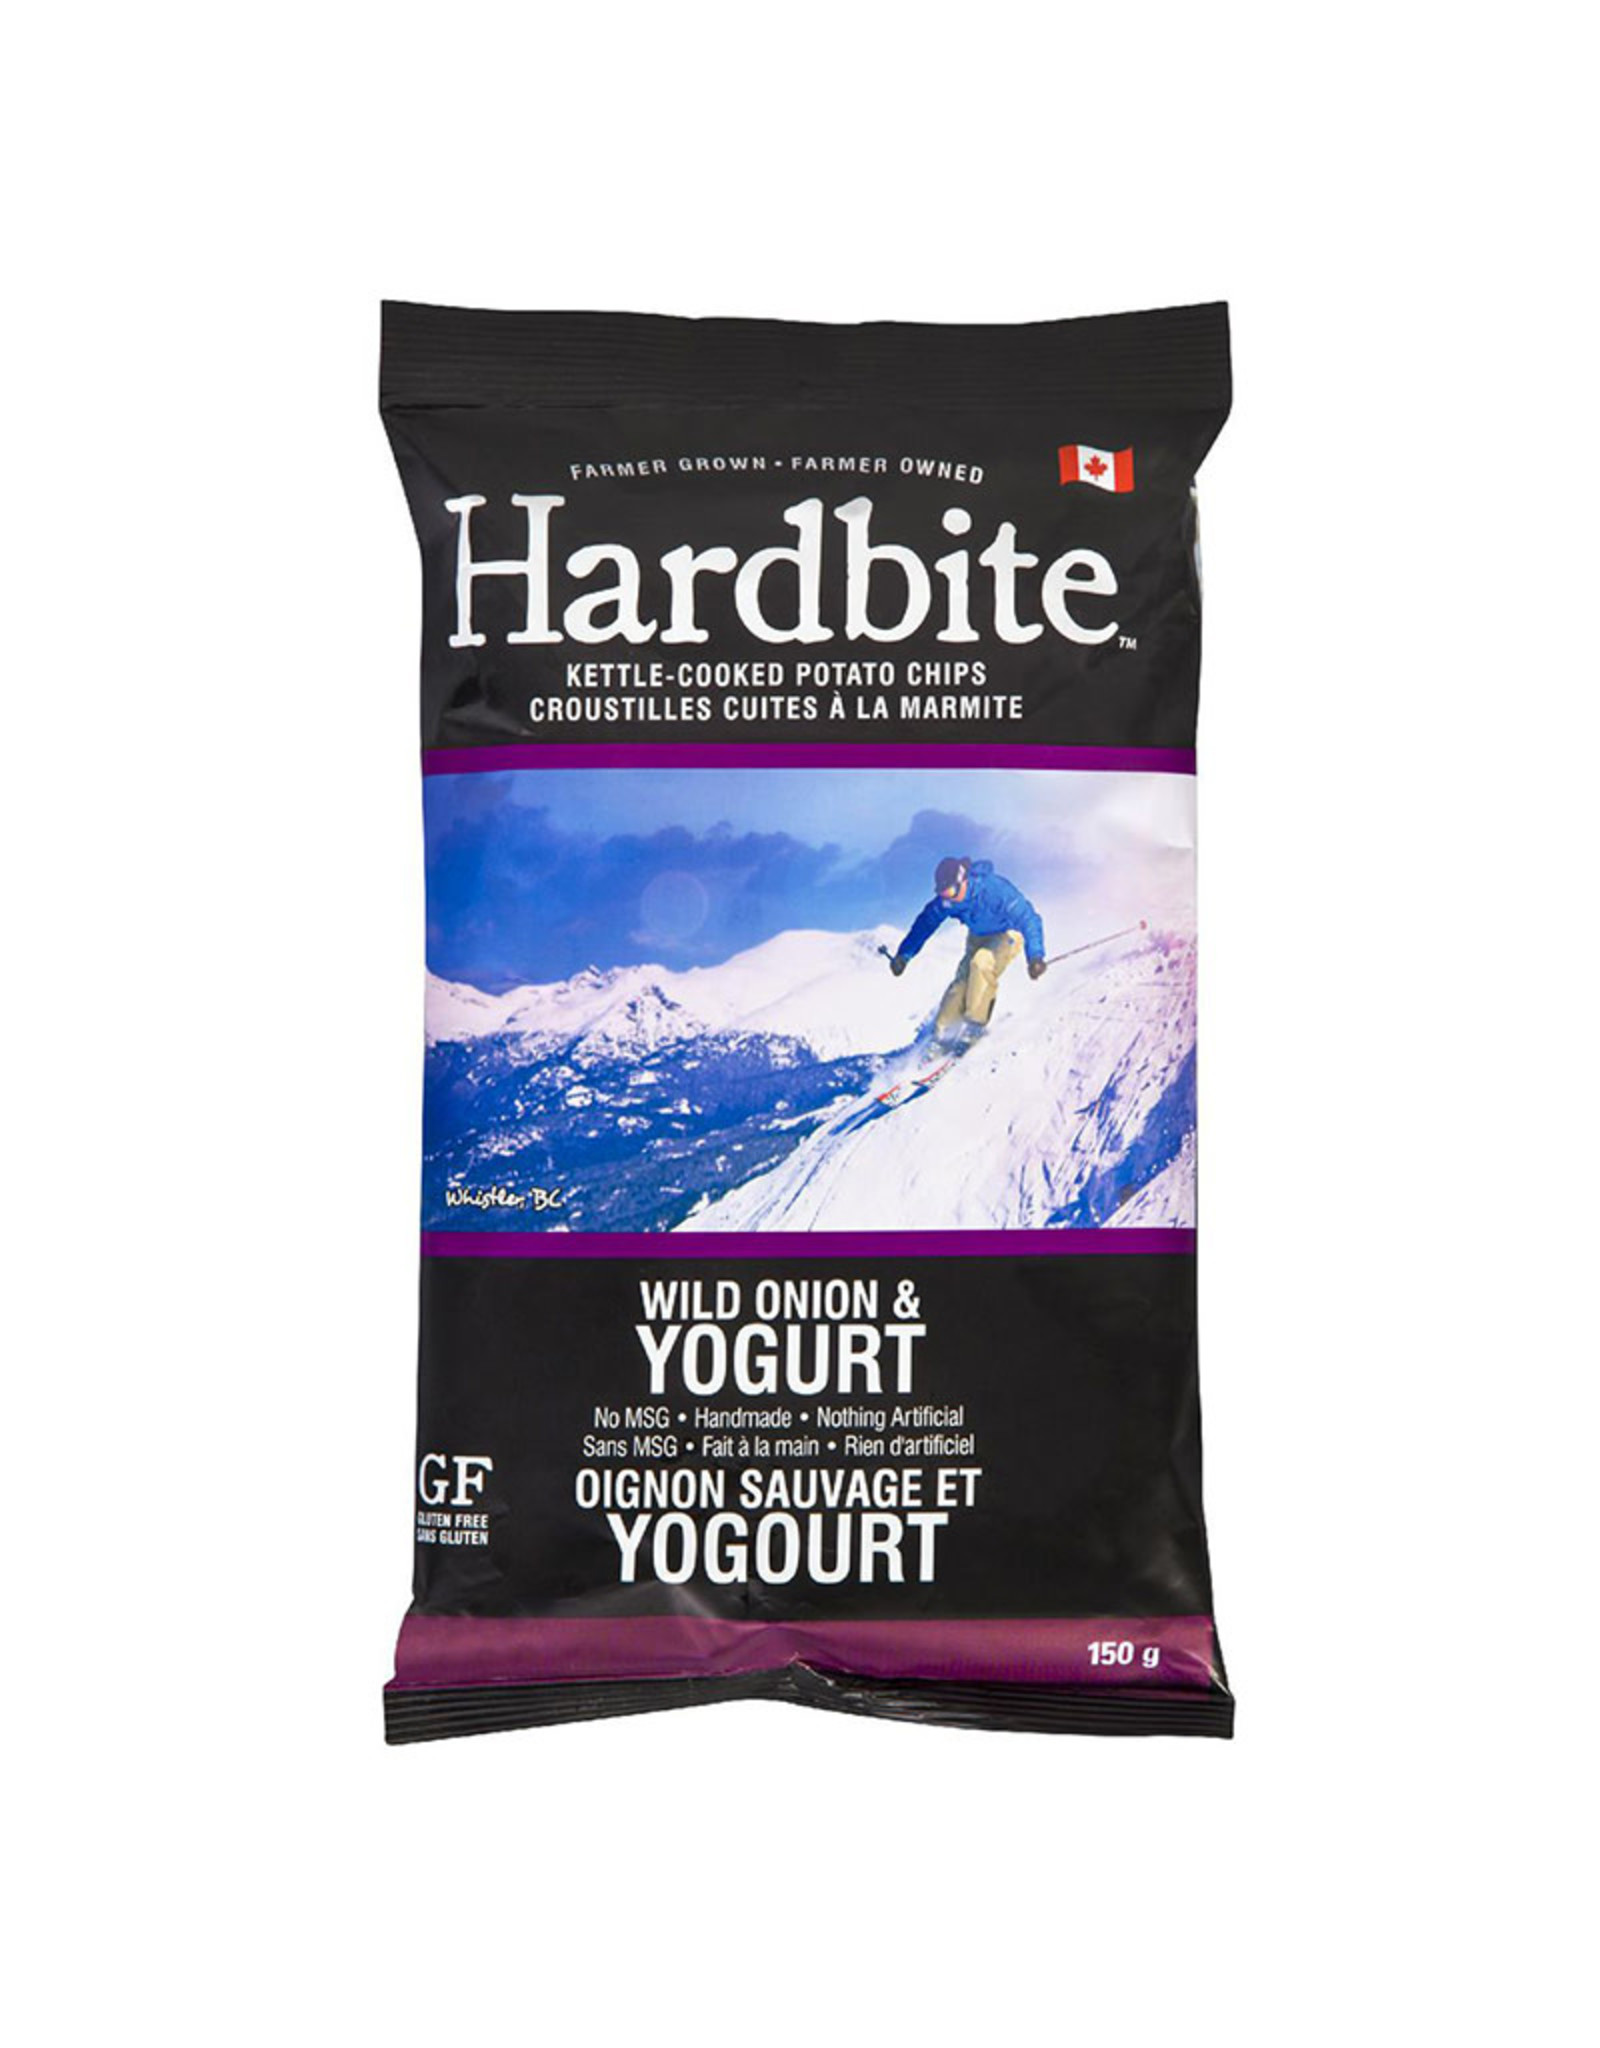 Hardbite Hardbite - Croustilles, Oignon Sauvage & Yogourt (150g)